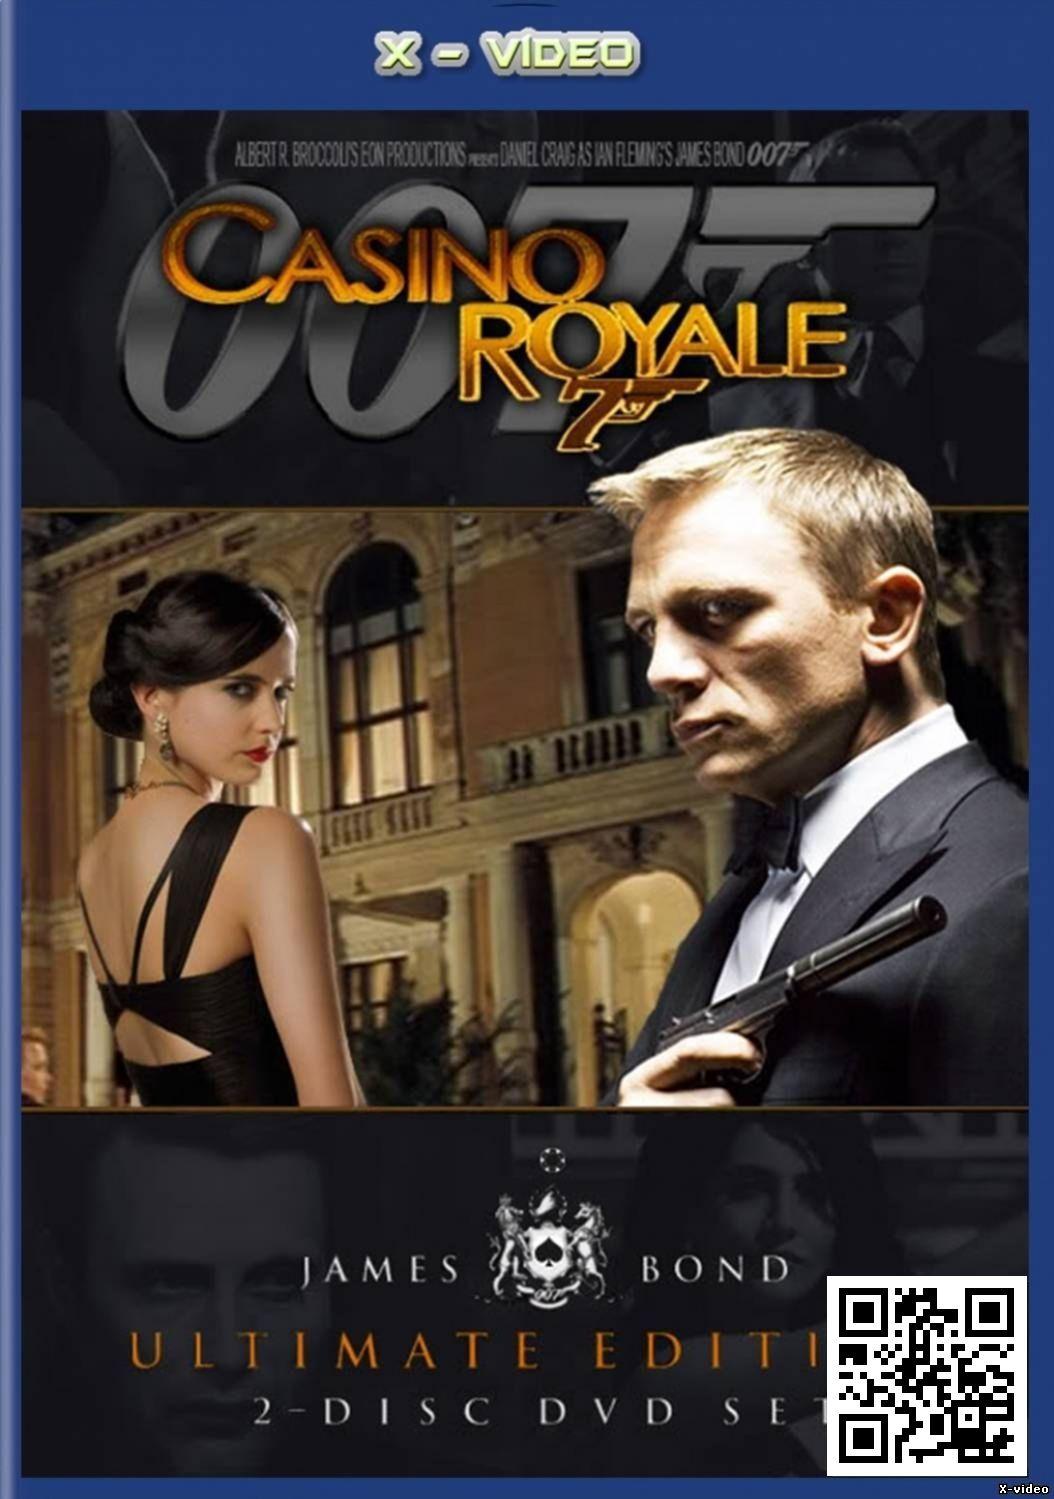 James bond casino royal cd terrible casino inc